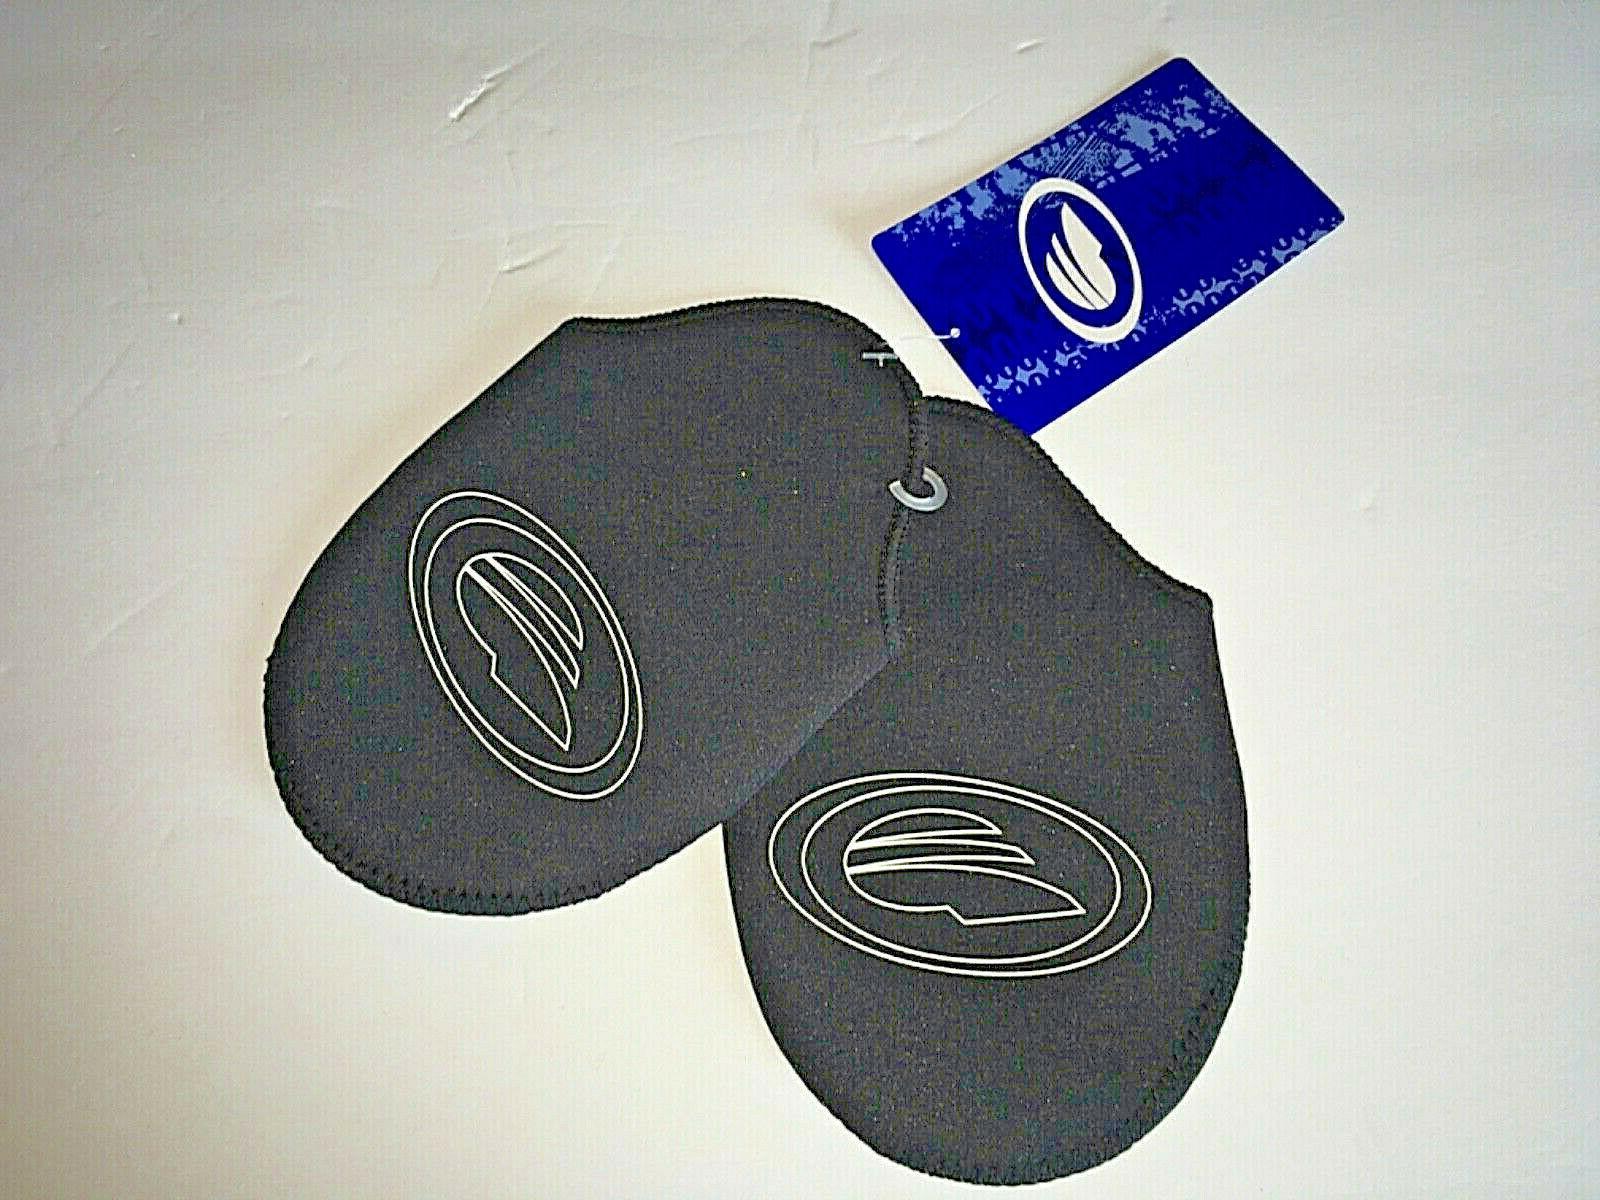 bicycle shoe toe covers black medium